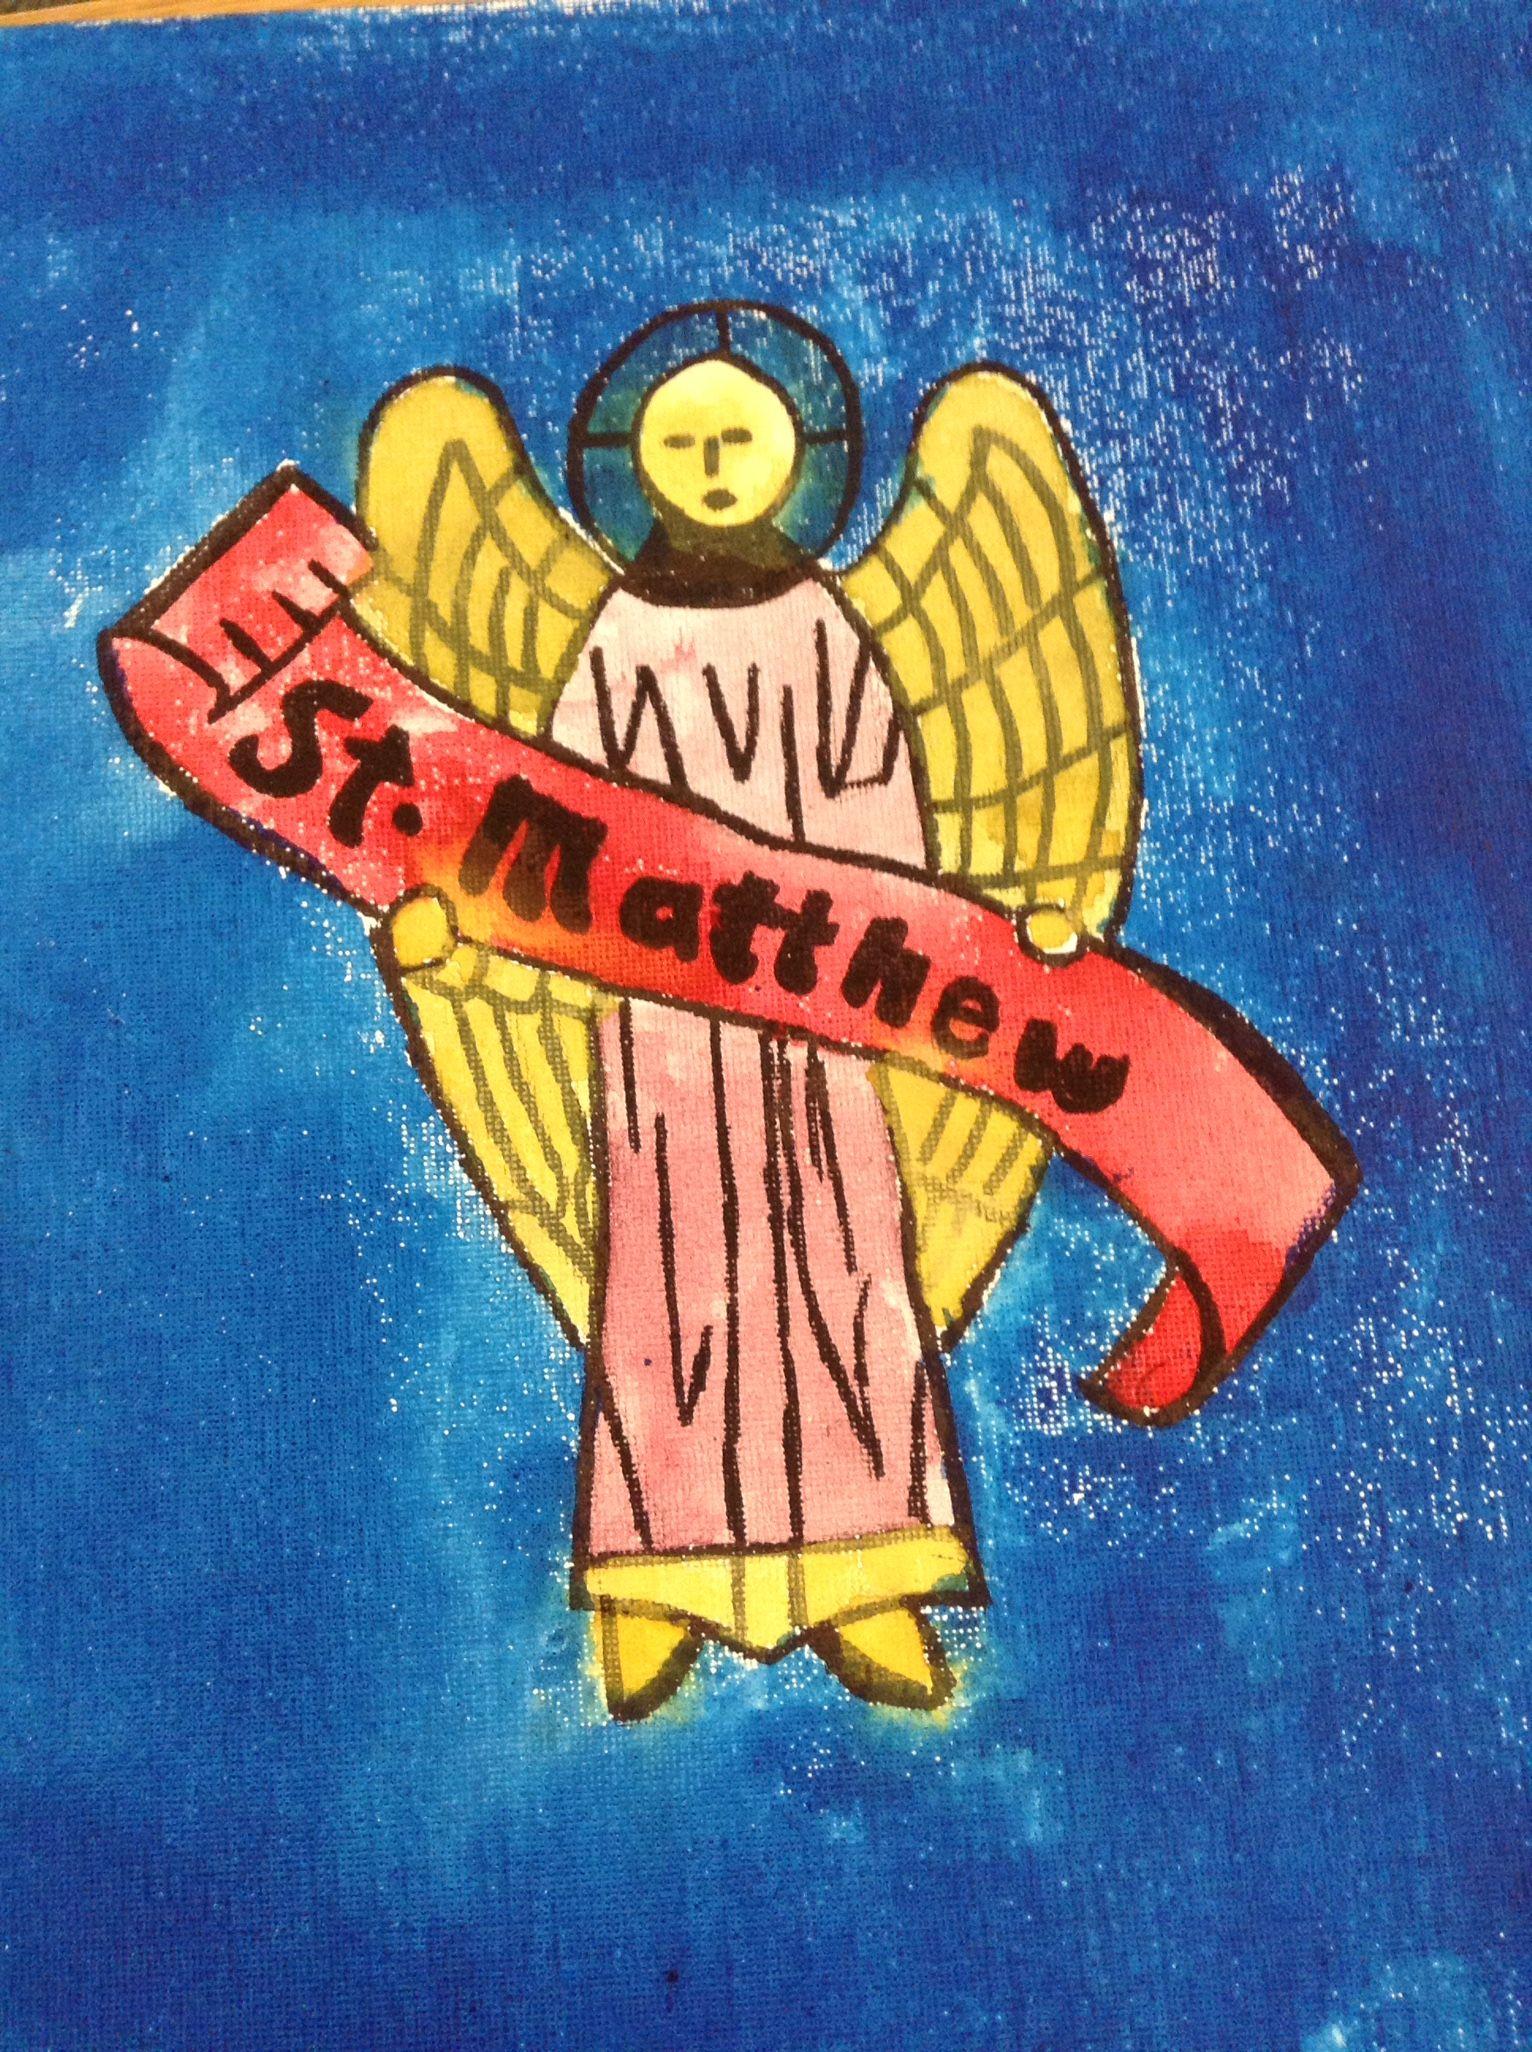 The symbol of the gospel of matthew is a human figure representing the symbol of the gospel of matthew is a human figure representing jesus human ancestors biocorpaavc Choice Image